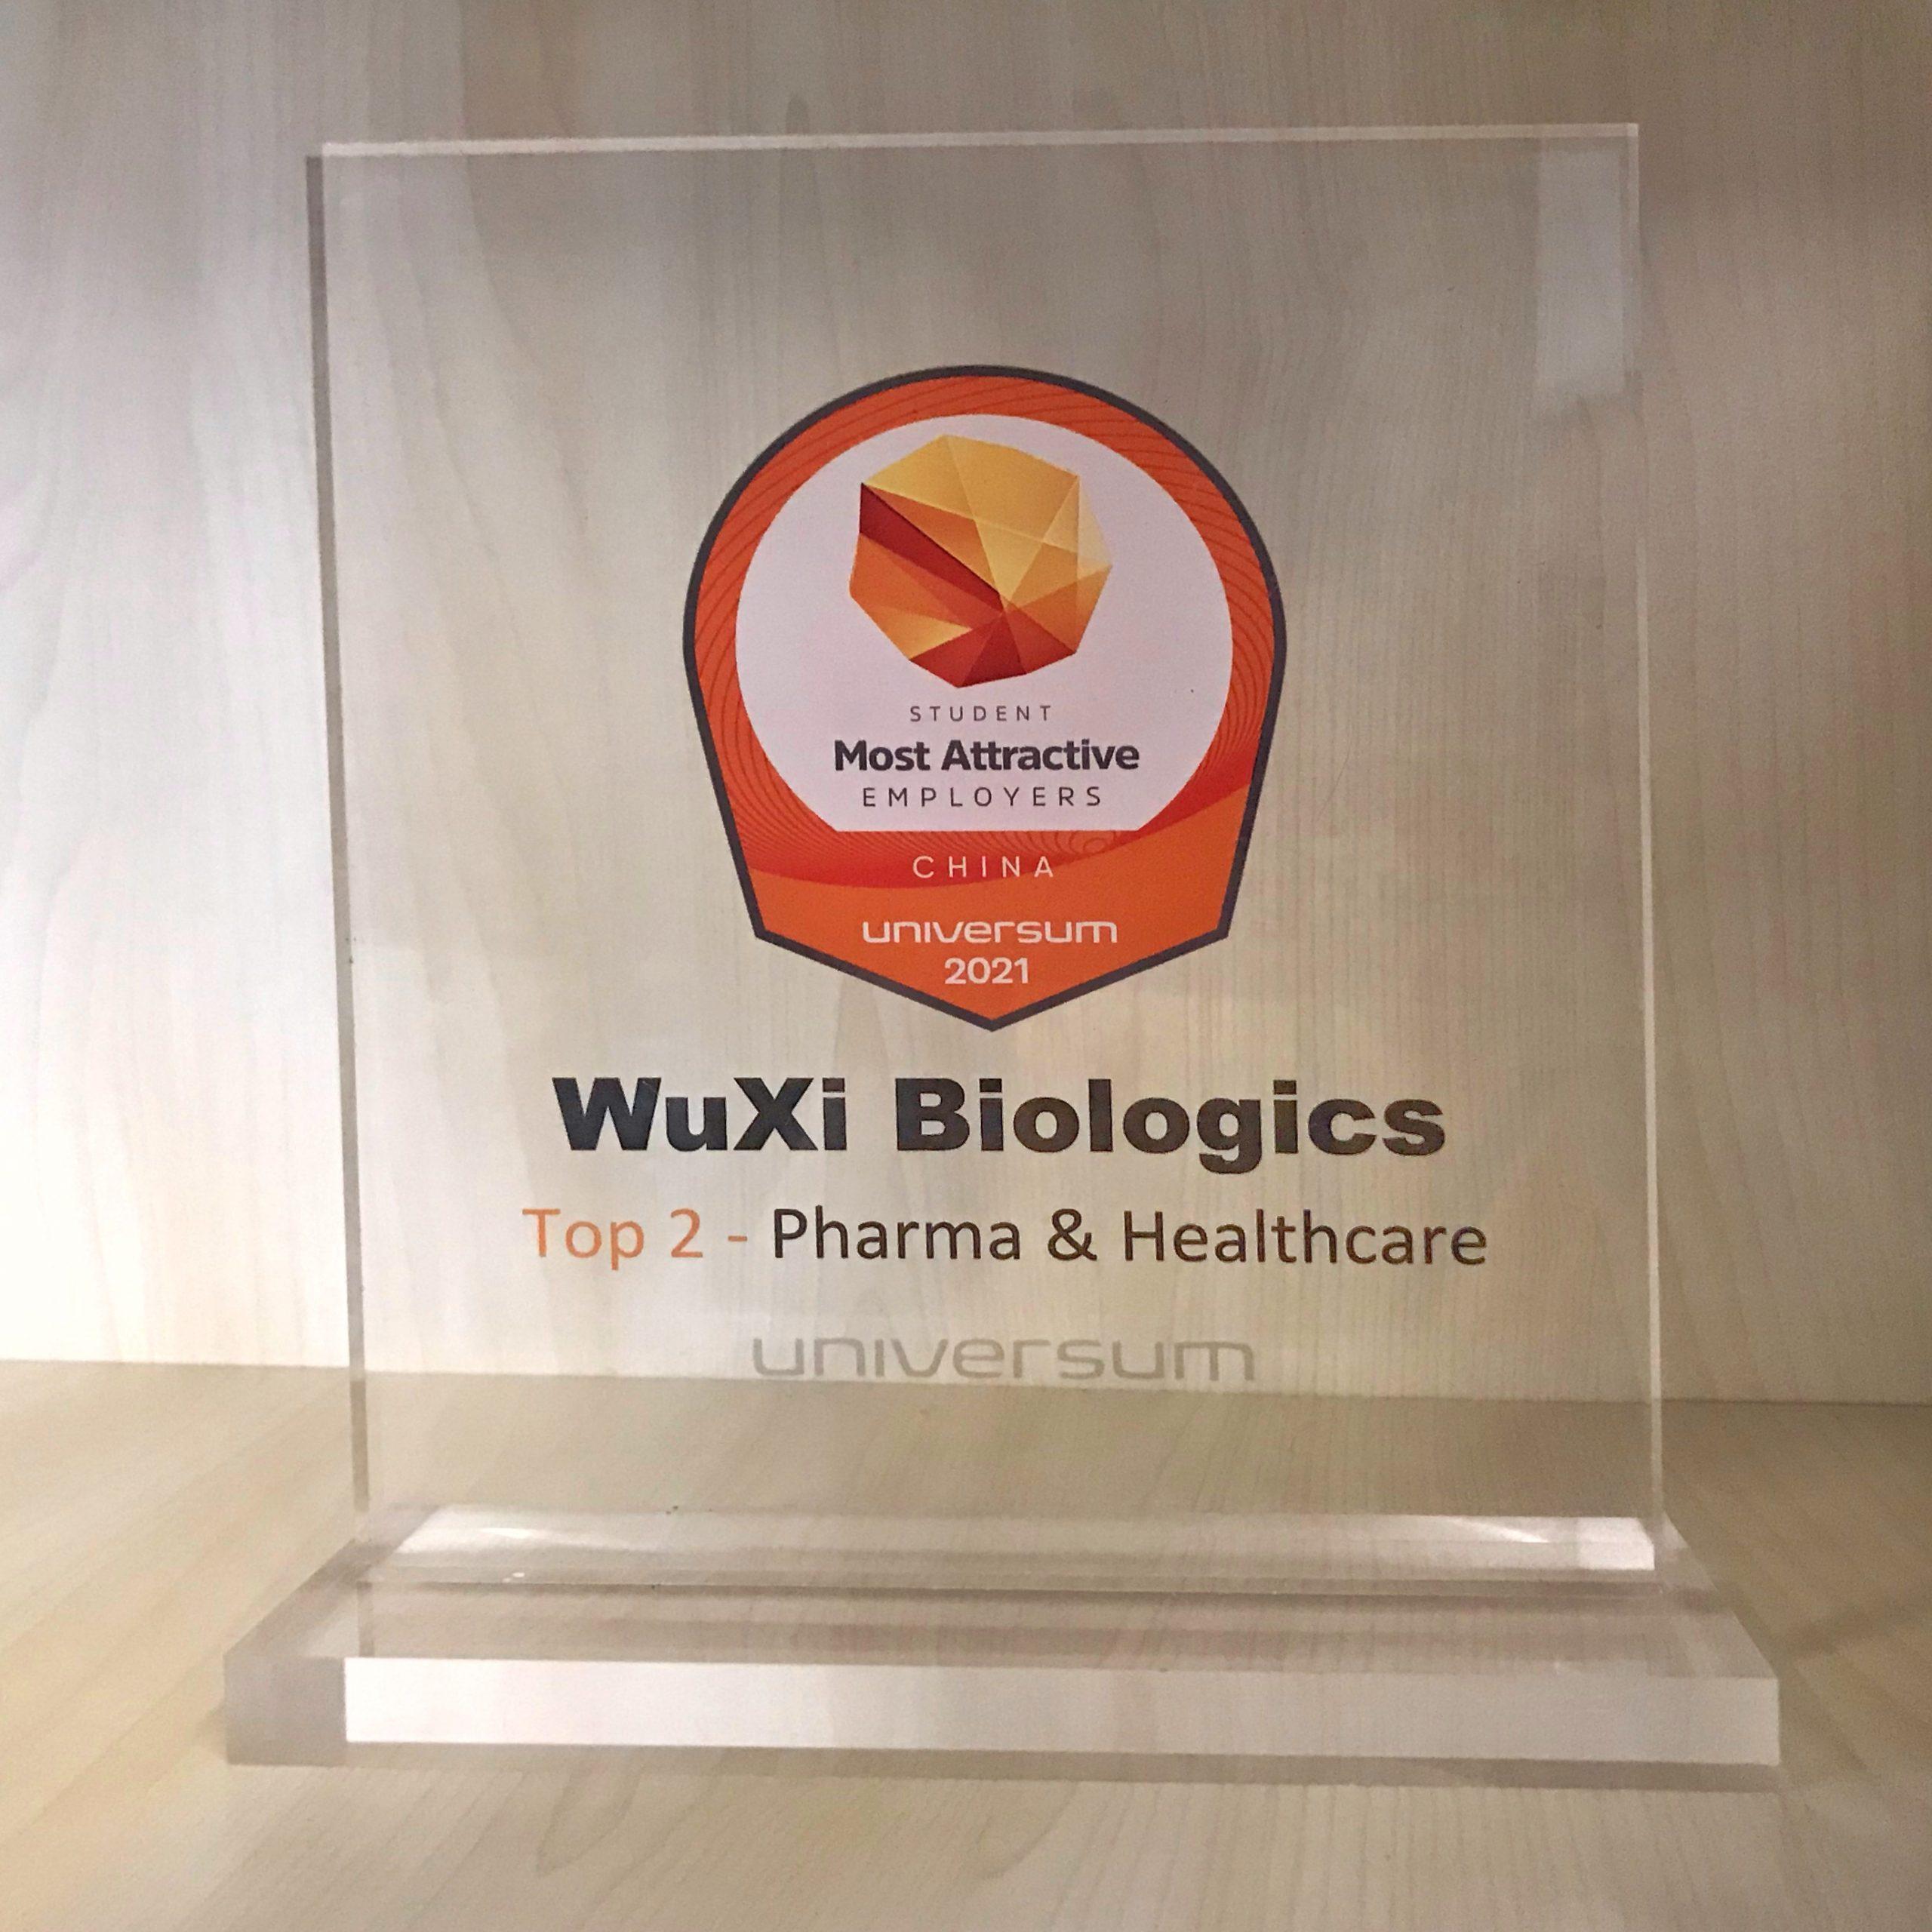 WuXi-Biologics-top2-Pharma-Healthcare-universum